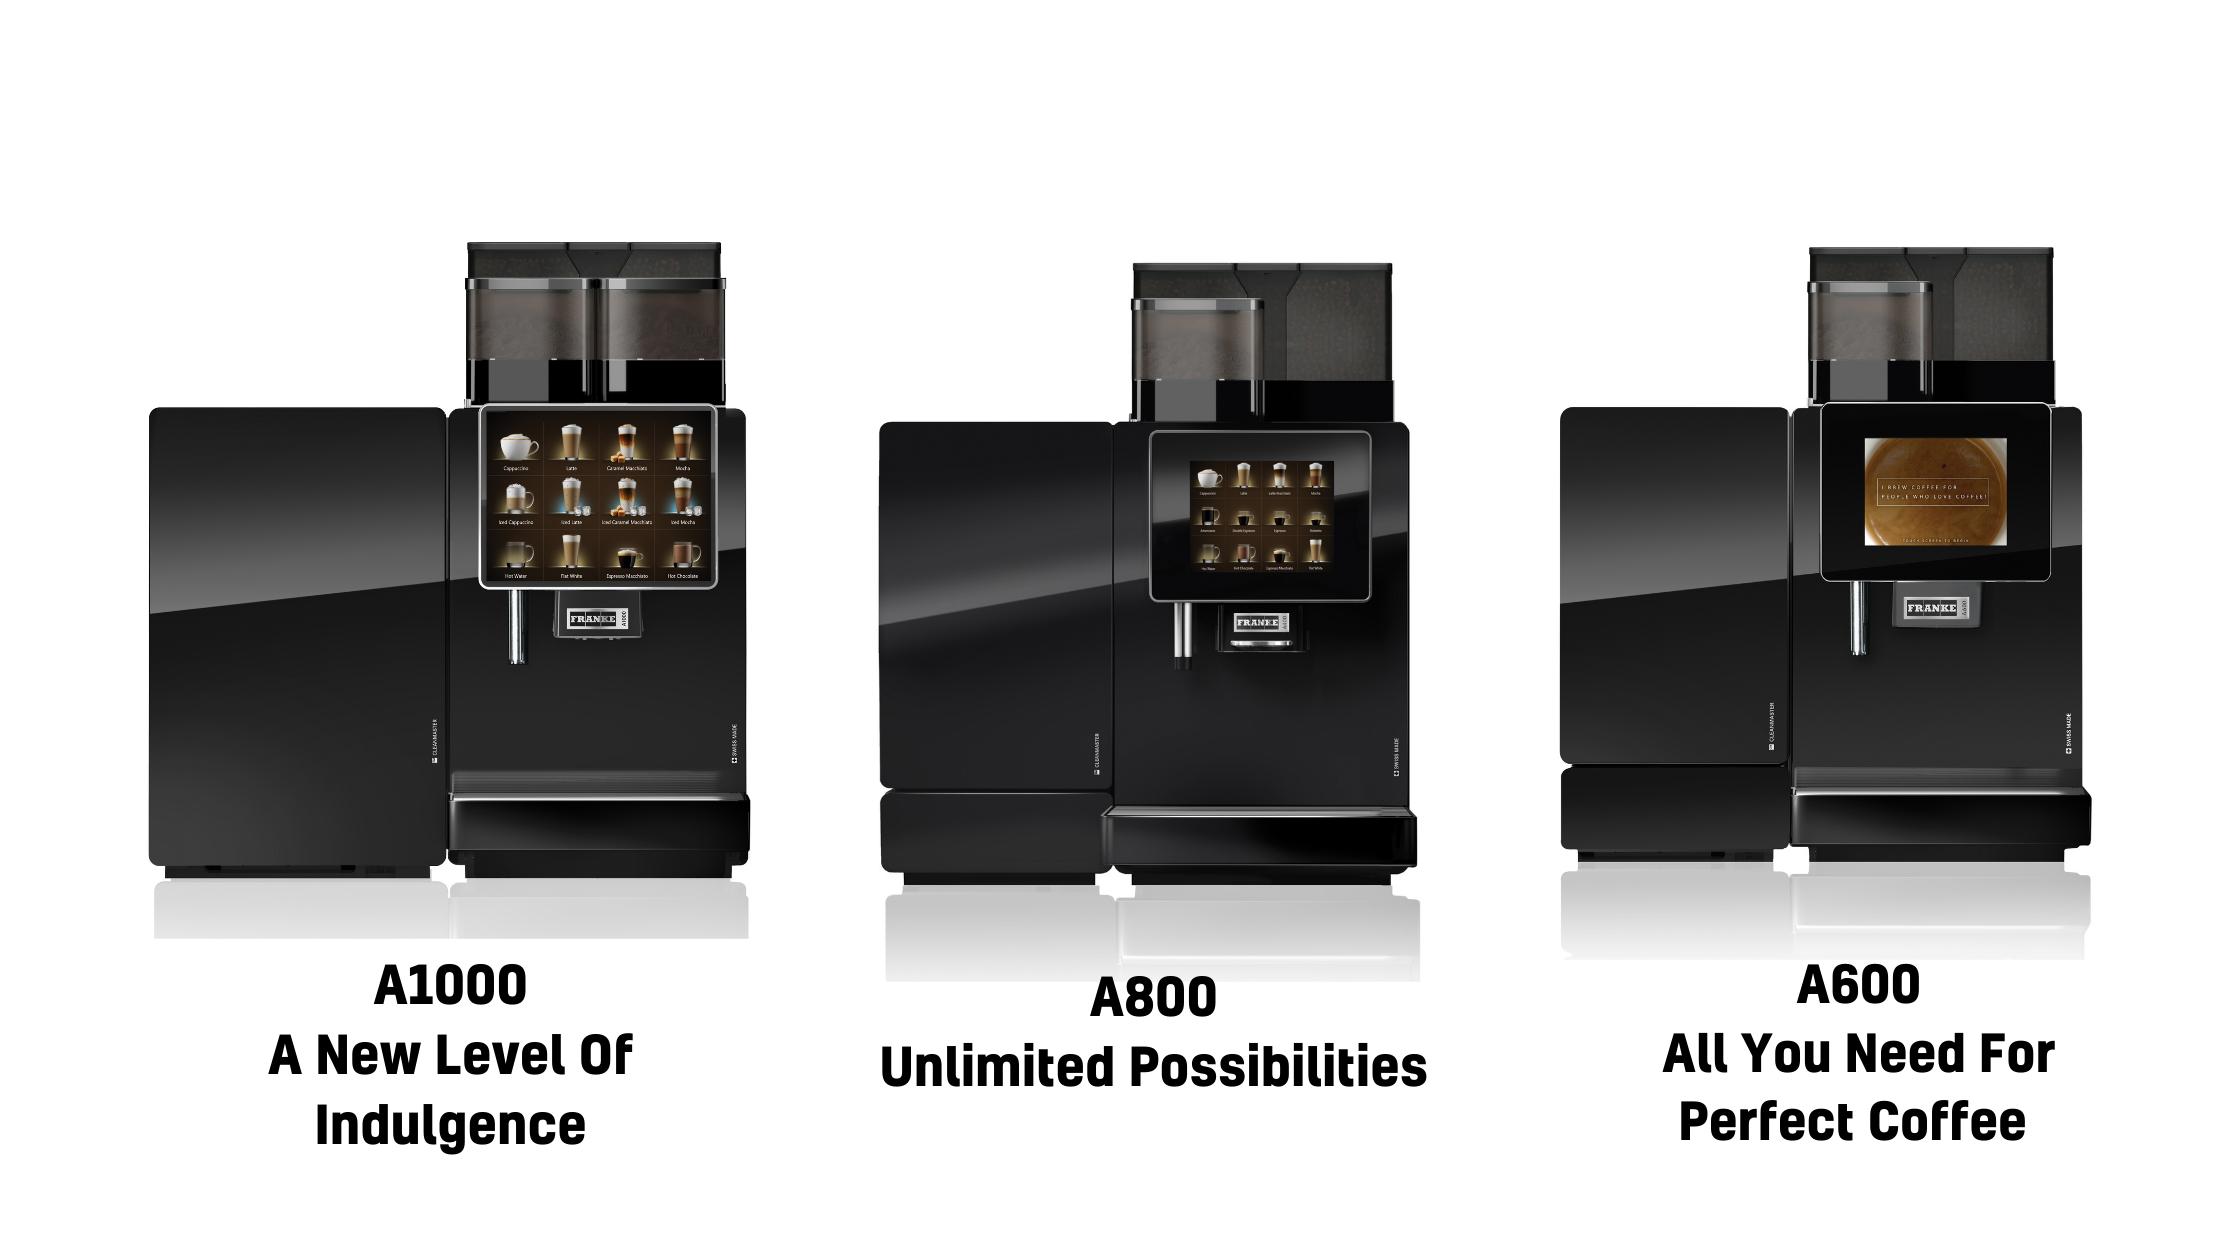 Franke Coffee Machines: A100, A800, A600